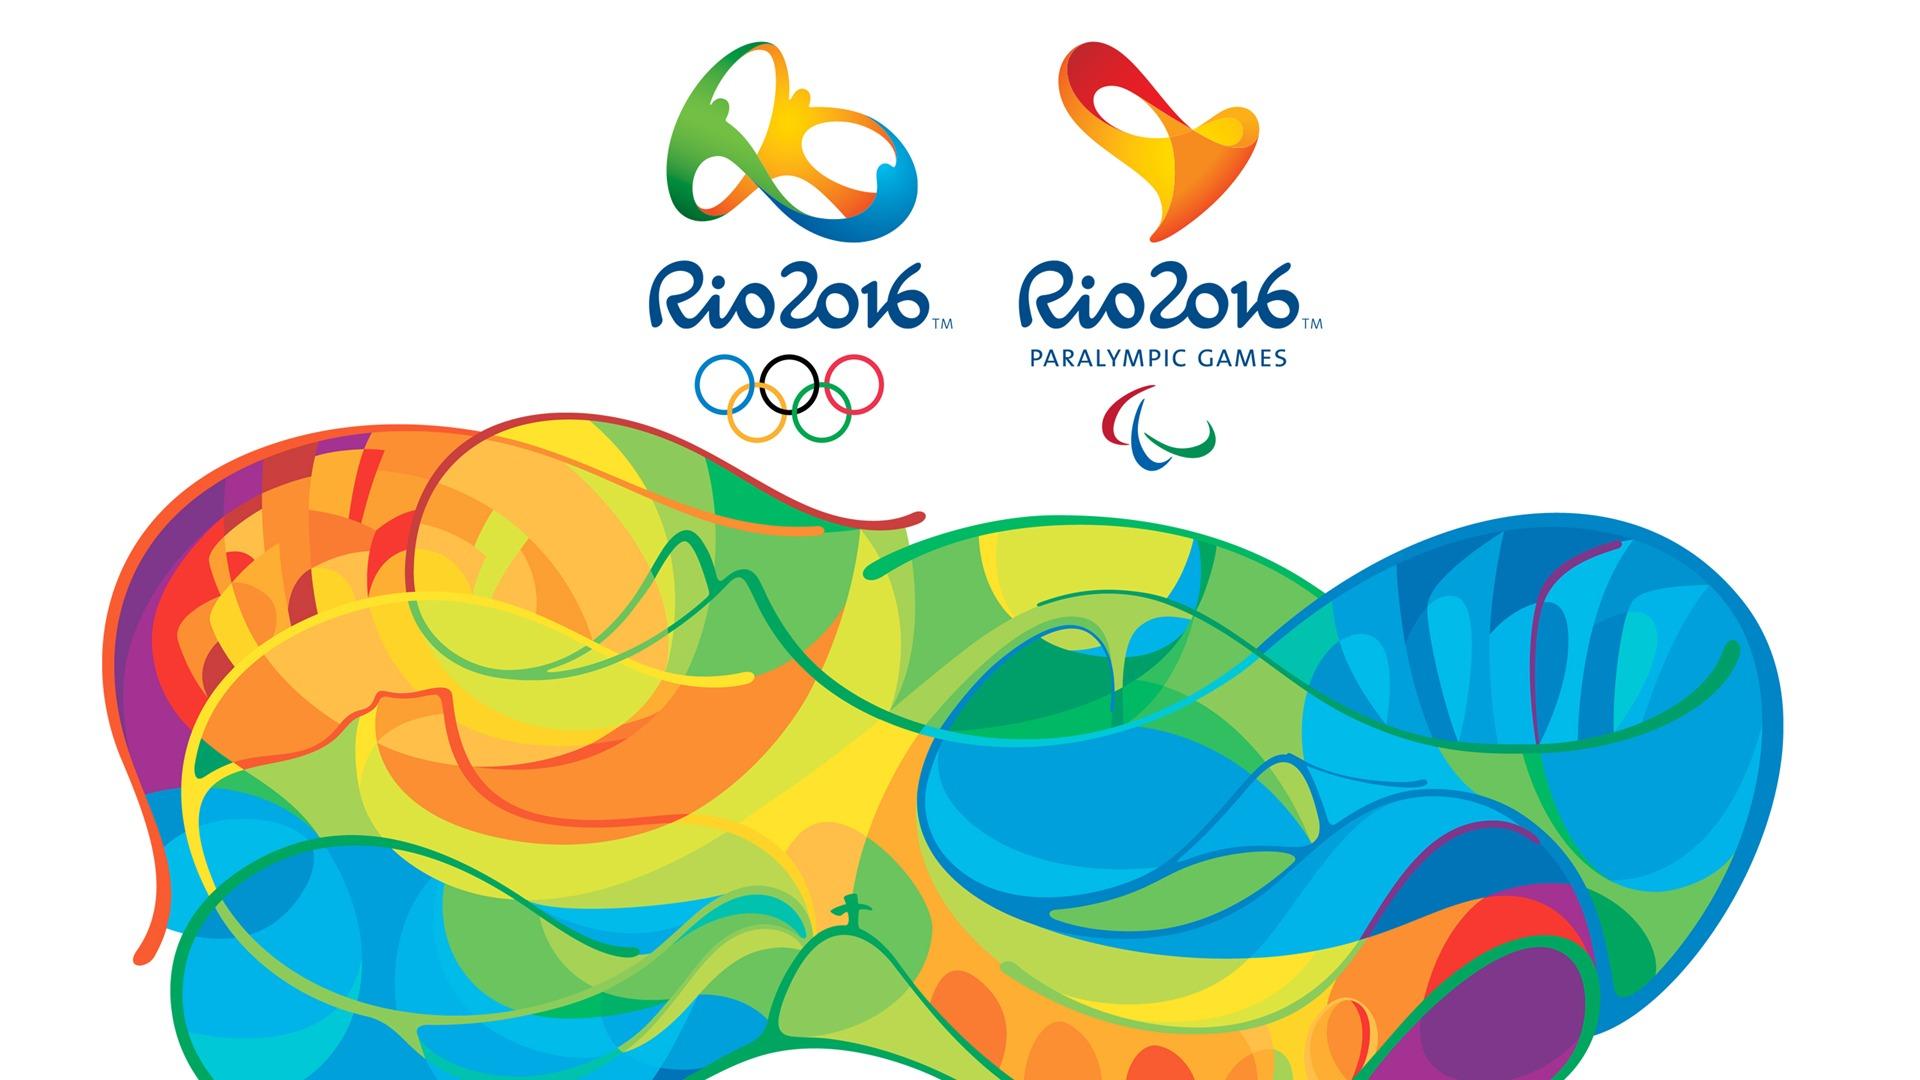 Jeux olympiques rio 2016 theme hd fonds d 39 cran 1920x1080 for Fond ecran hd 2016